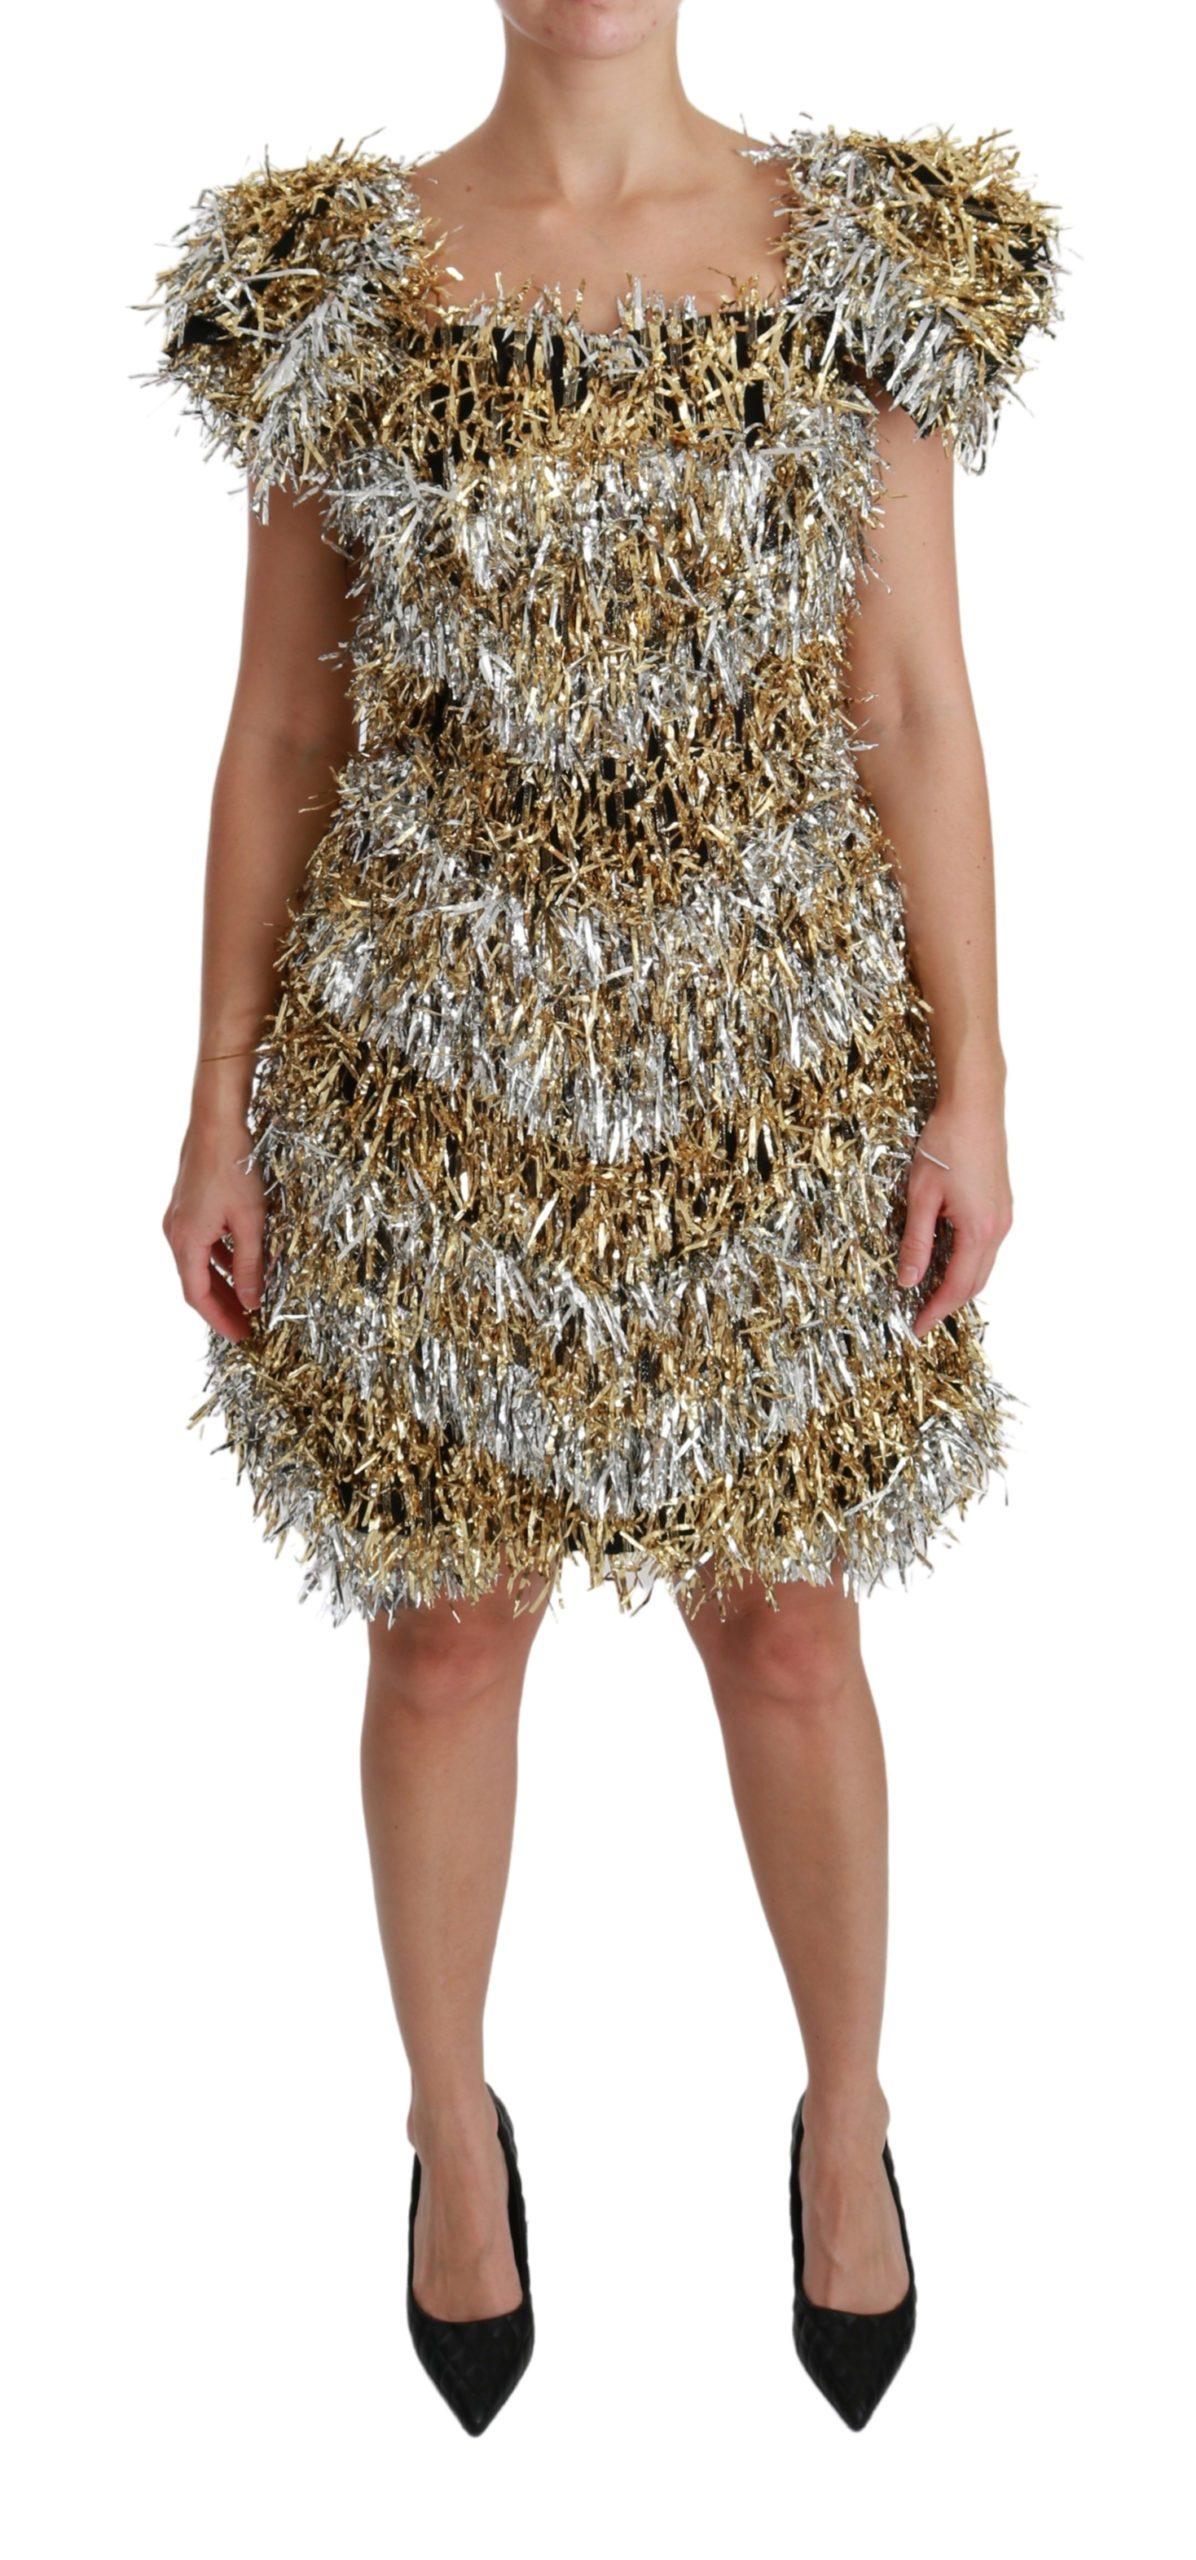 Dolce & Gabbana Women's Sheath Mini Shift Gown Dress Silver DR2510 - IT40|S